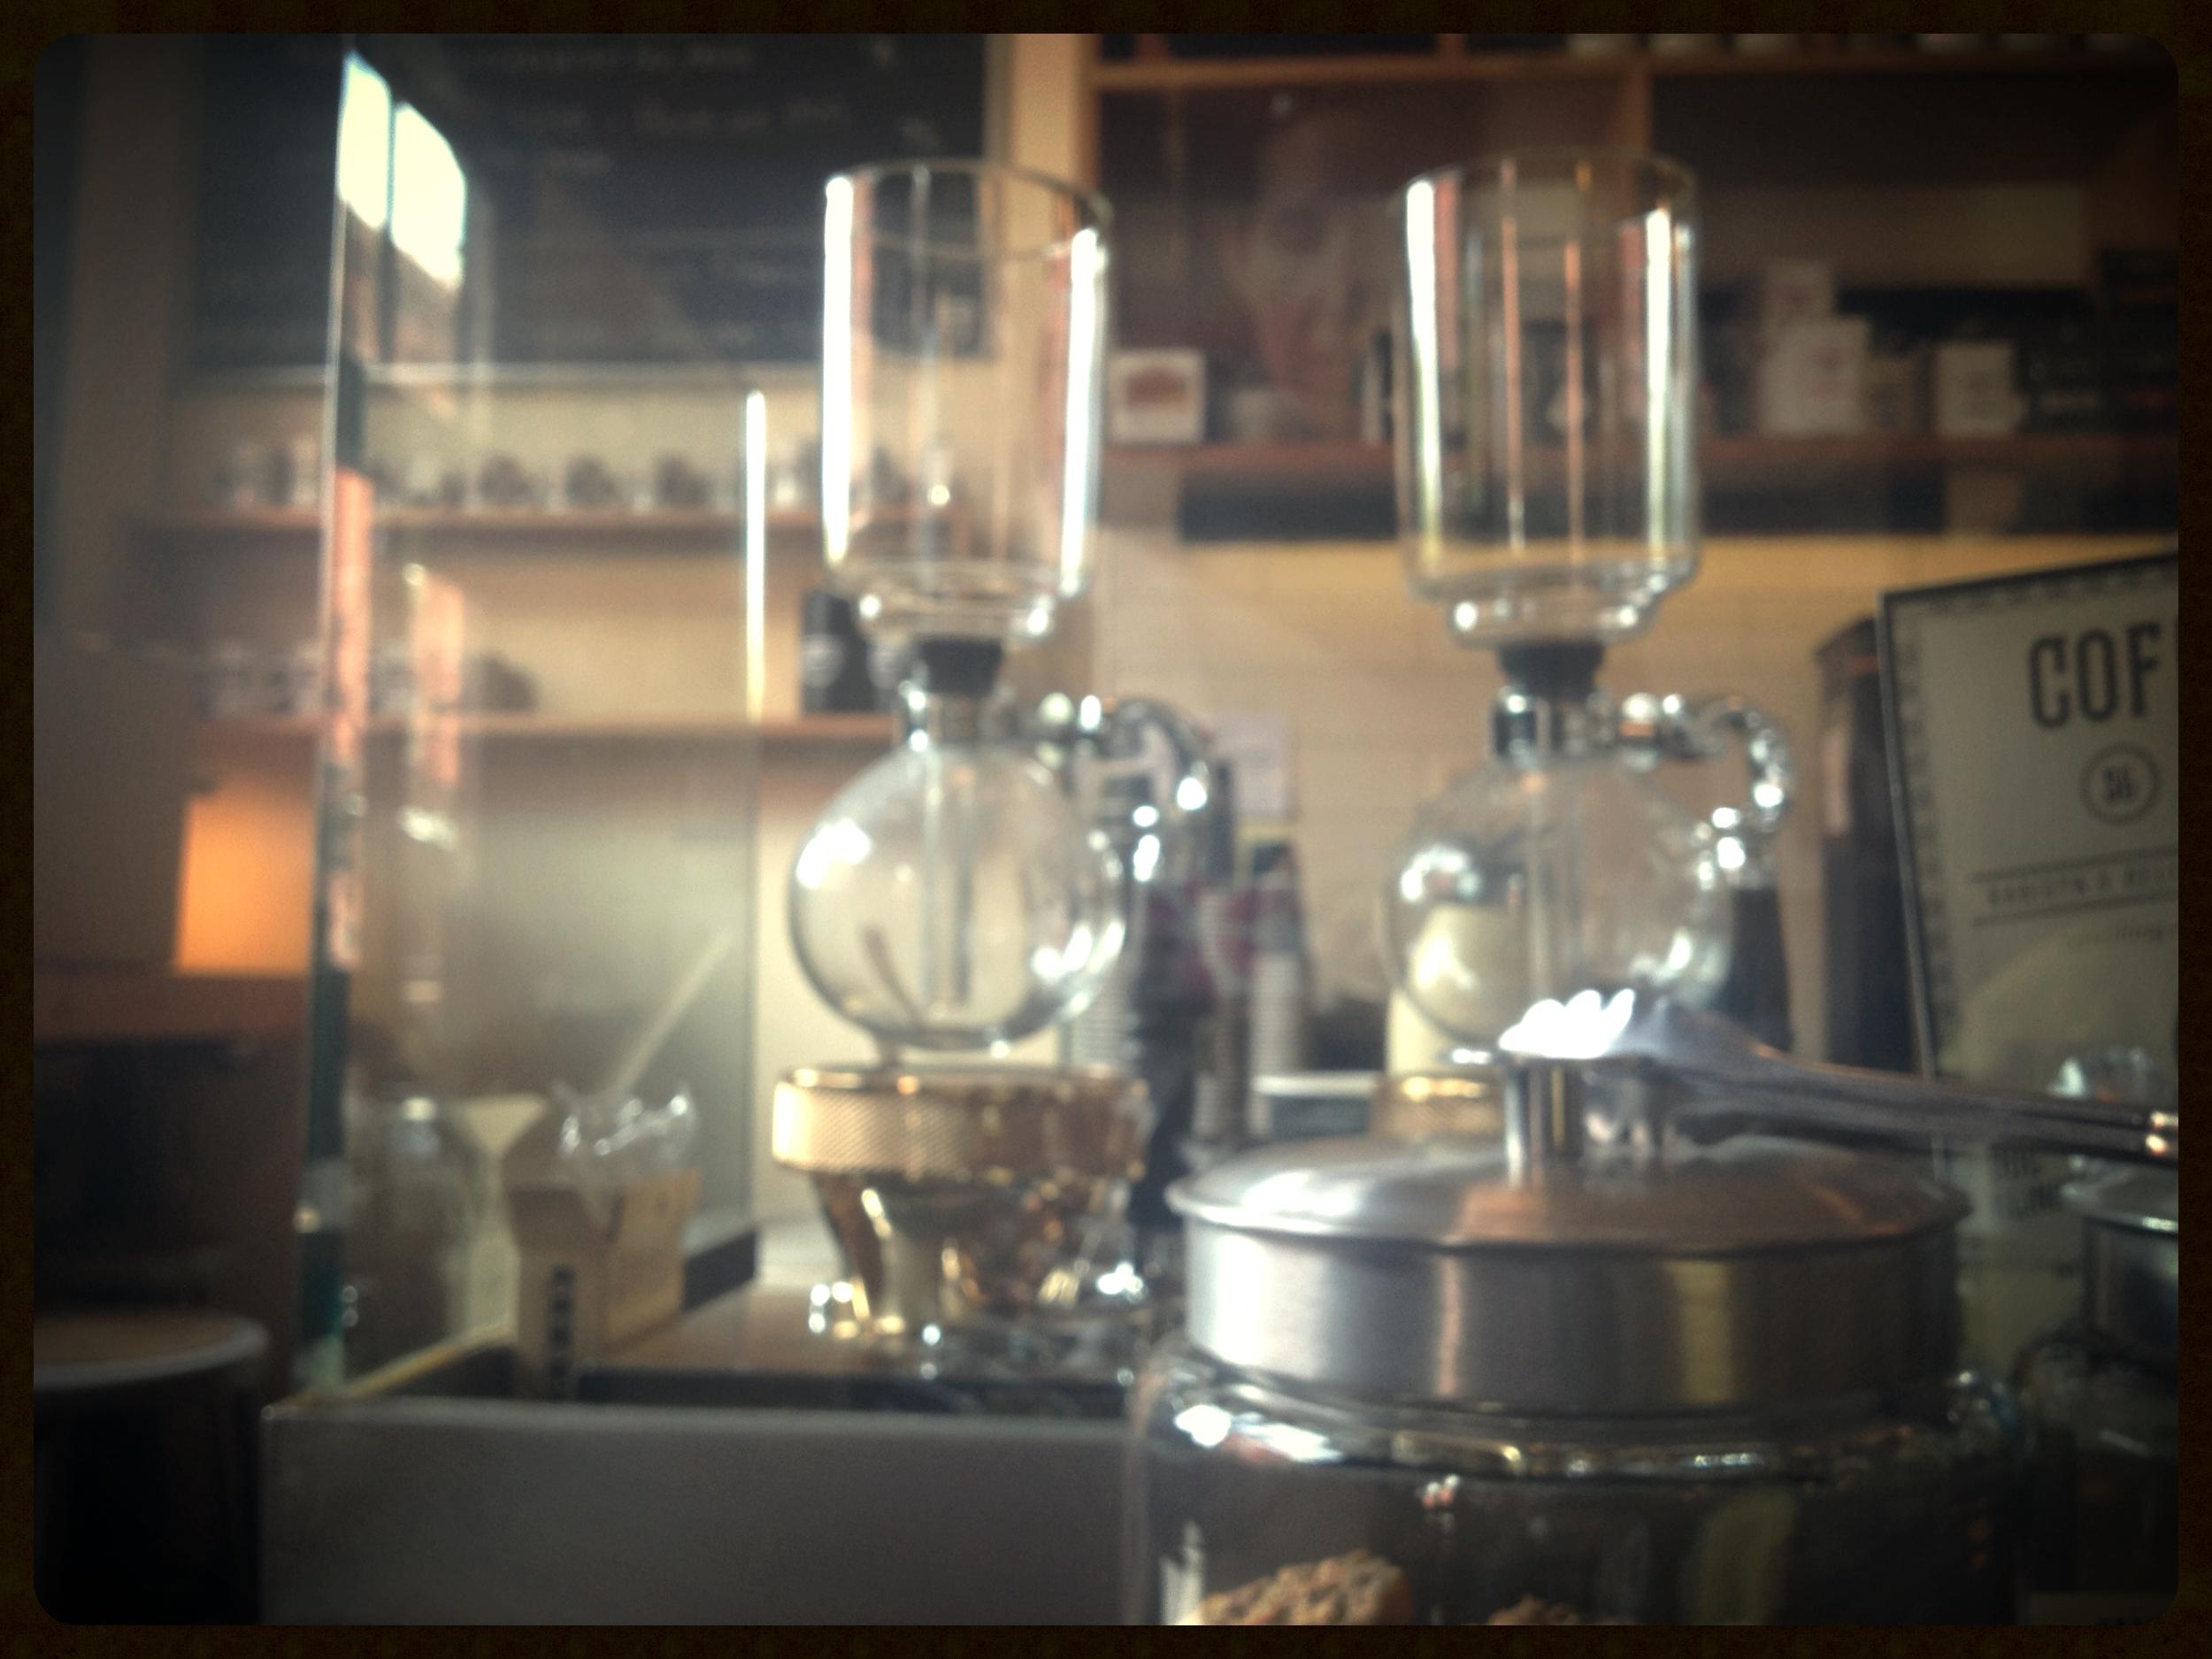 steampunk meets coffee